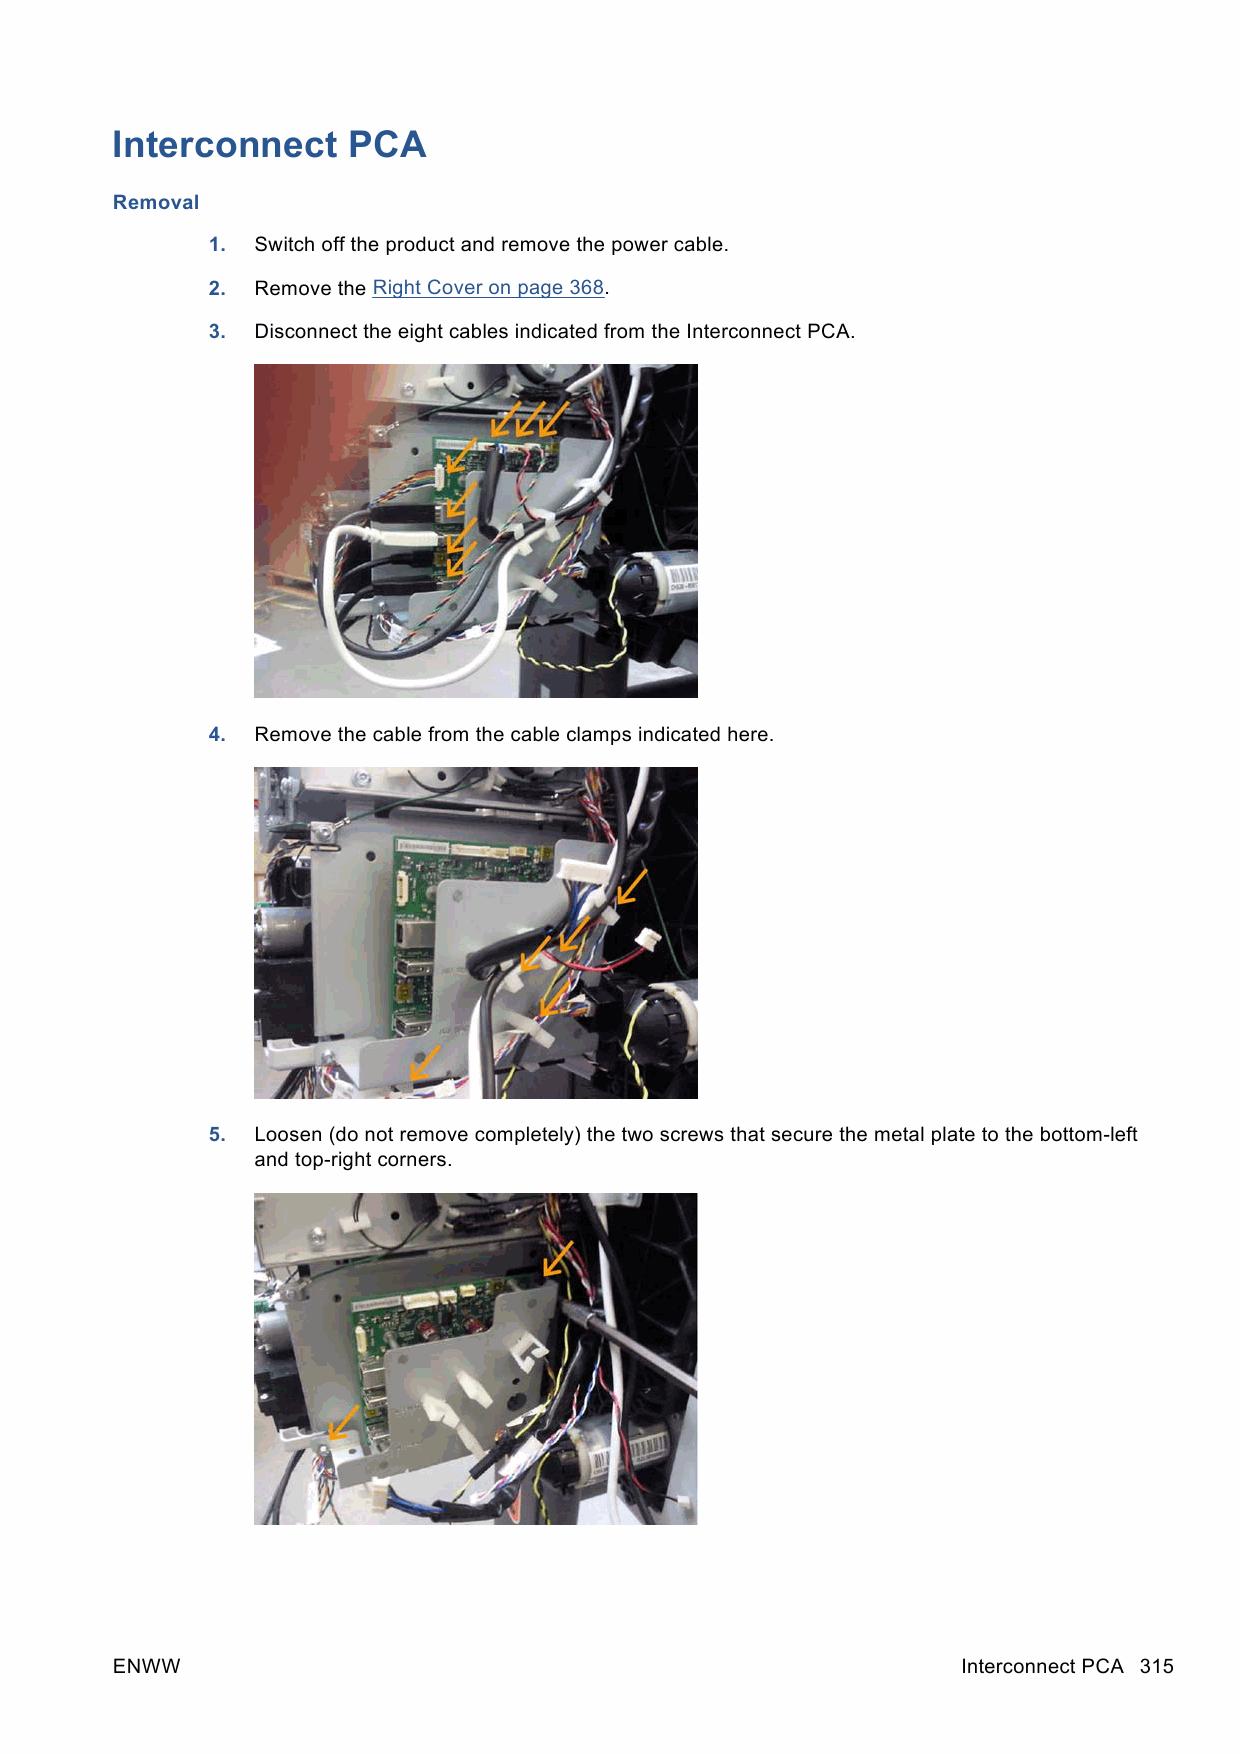 national automotive sampling system crashworthness data system analytical users manual 2001 file